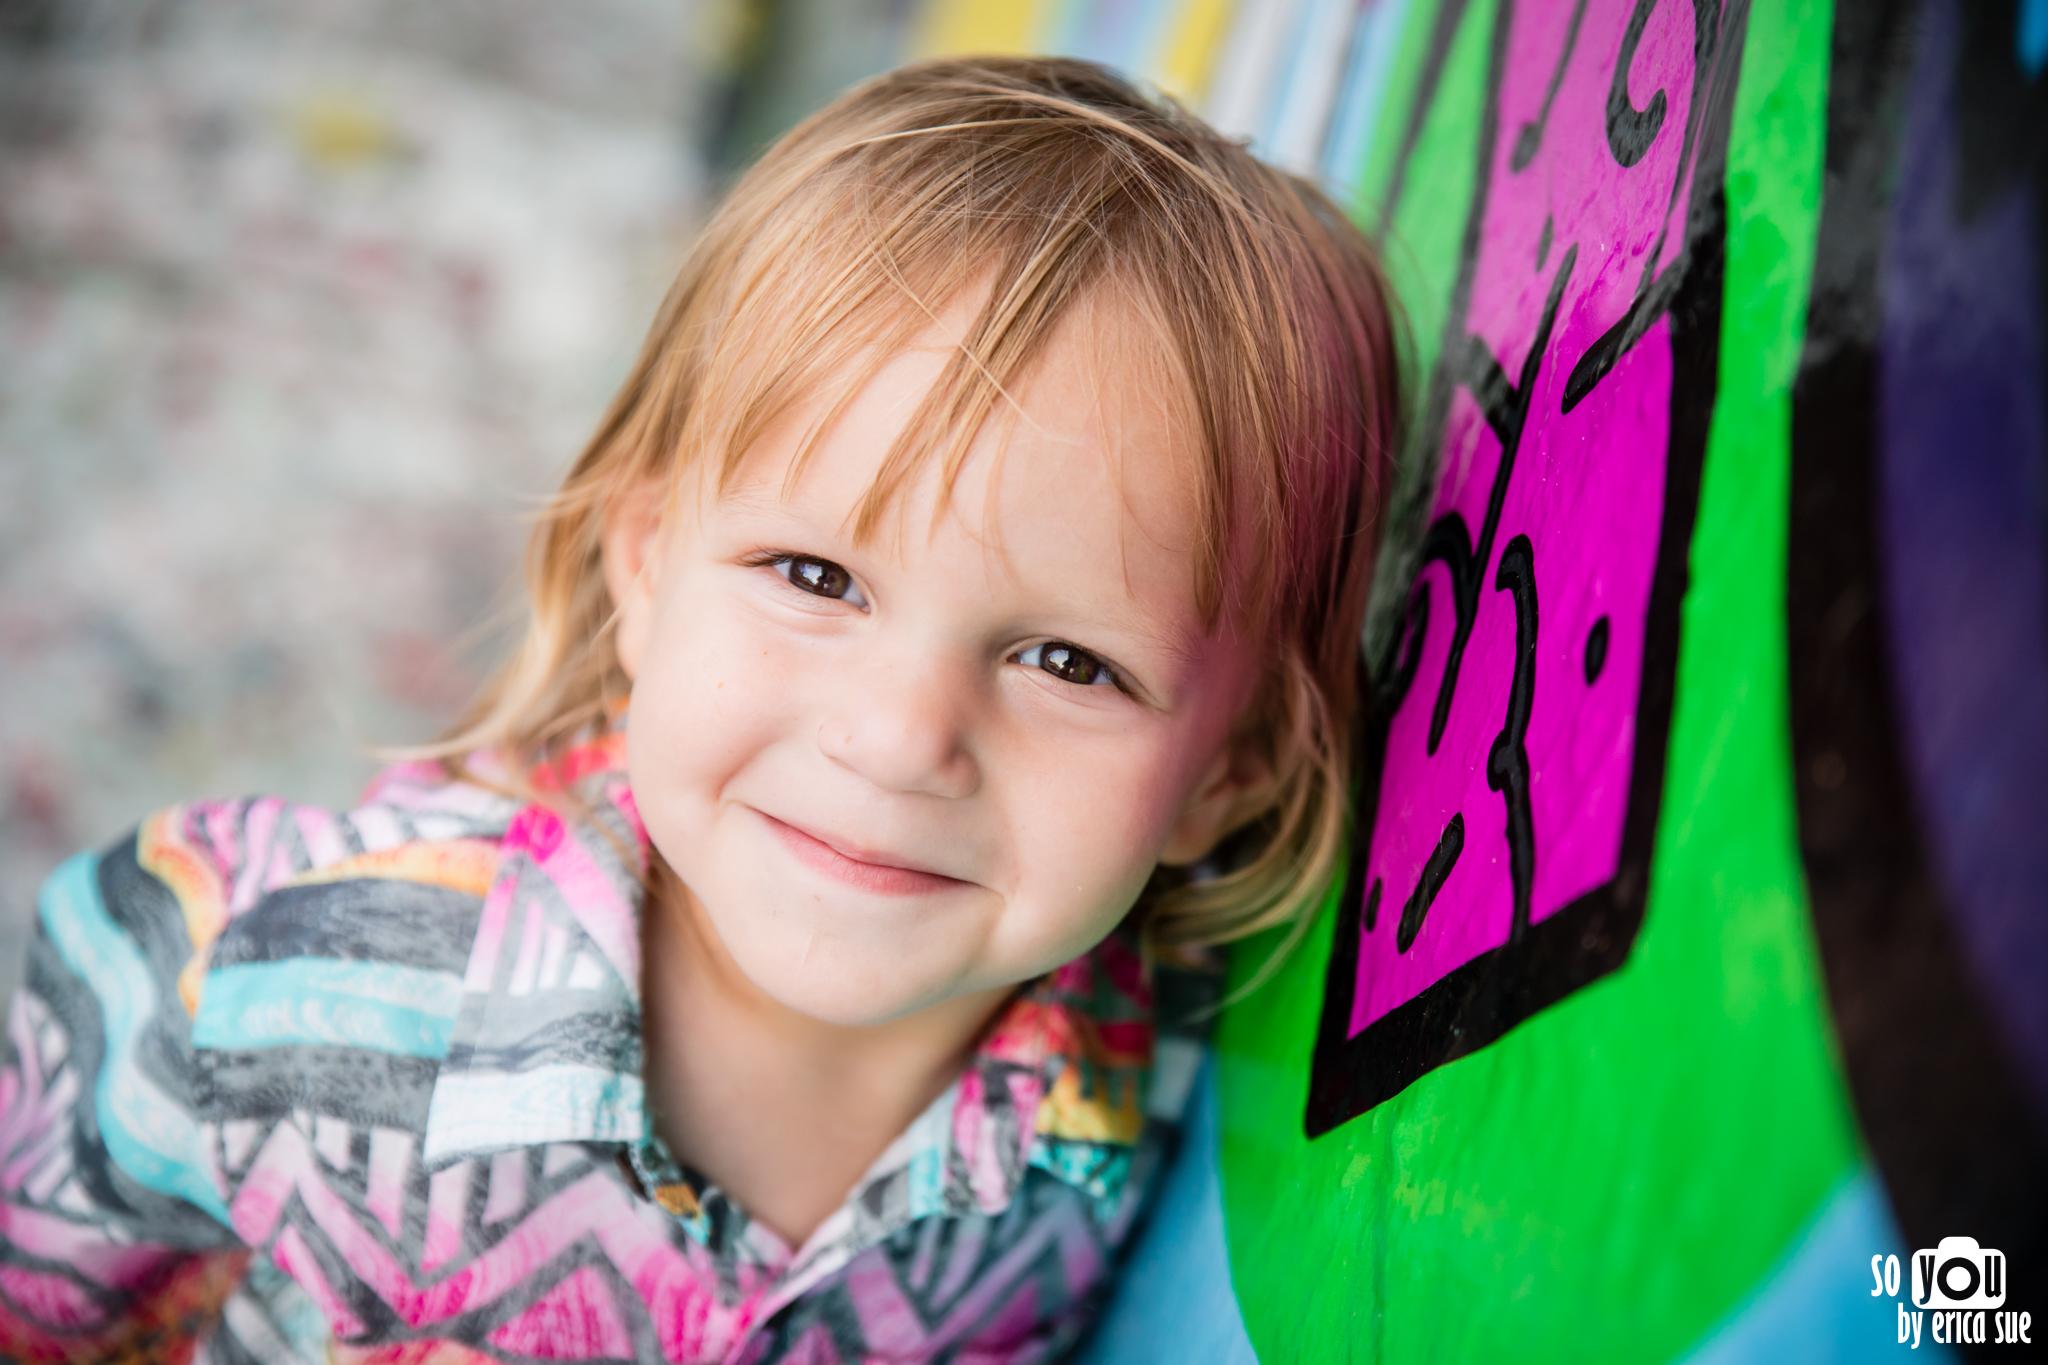 so-you-by-erica-wynwood-photo-shoot-family-photography-miami-7392.jpg